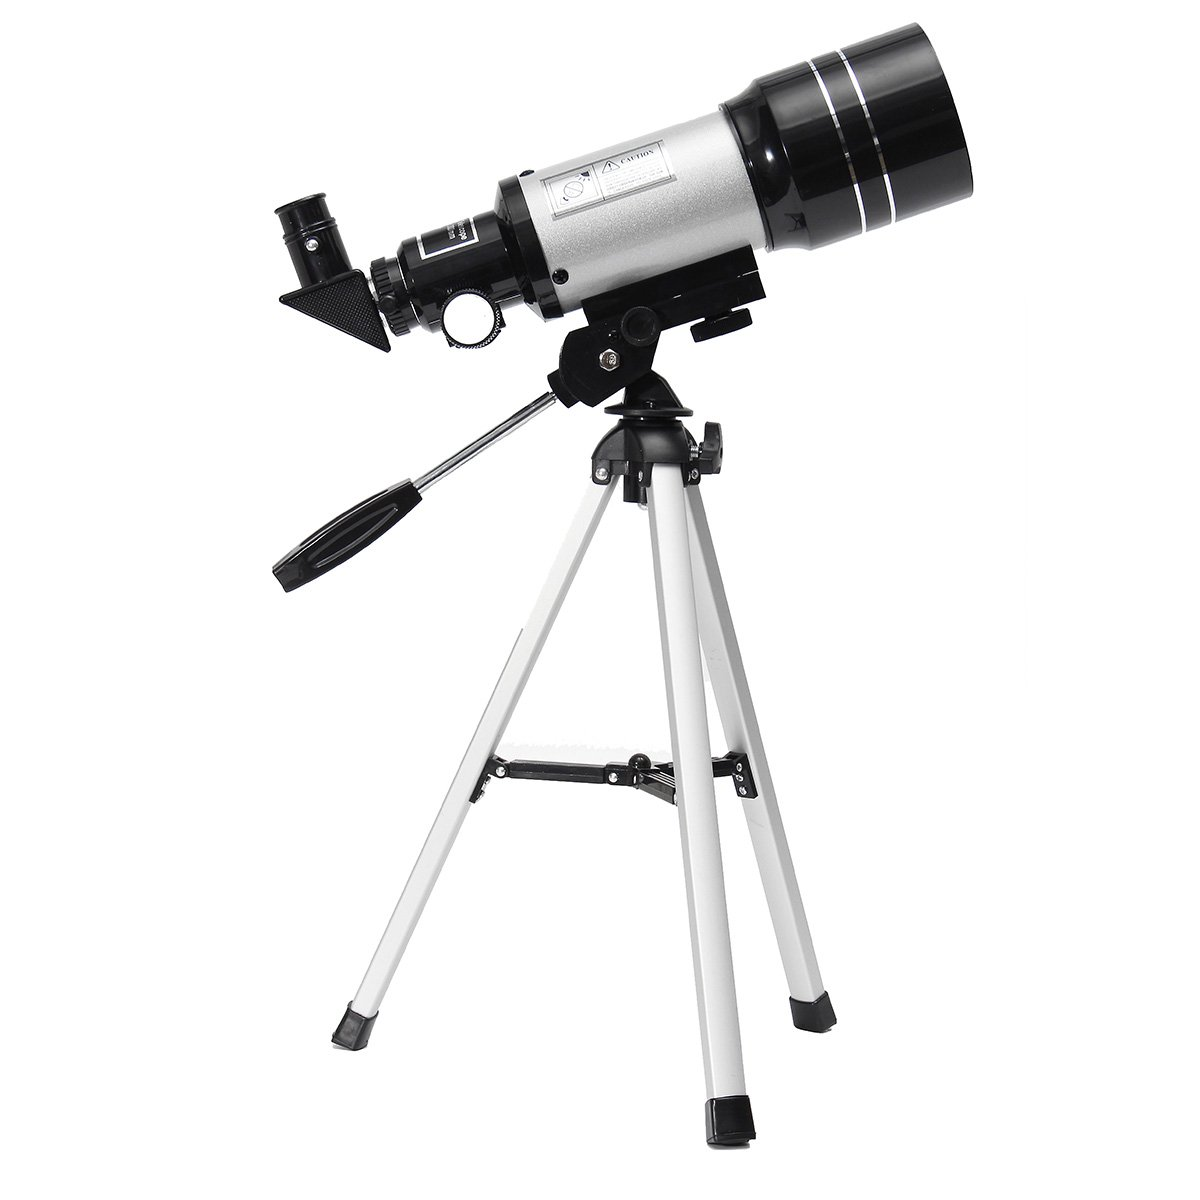 Ochoos Camping Telescope & Binoculars - Outdoor F30070M HD Monocular High Definition Terrestrial Astronomical Telescope with Tripod